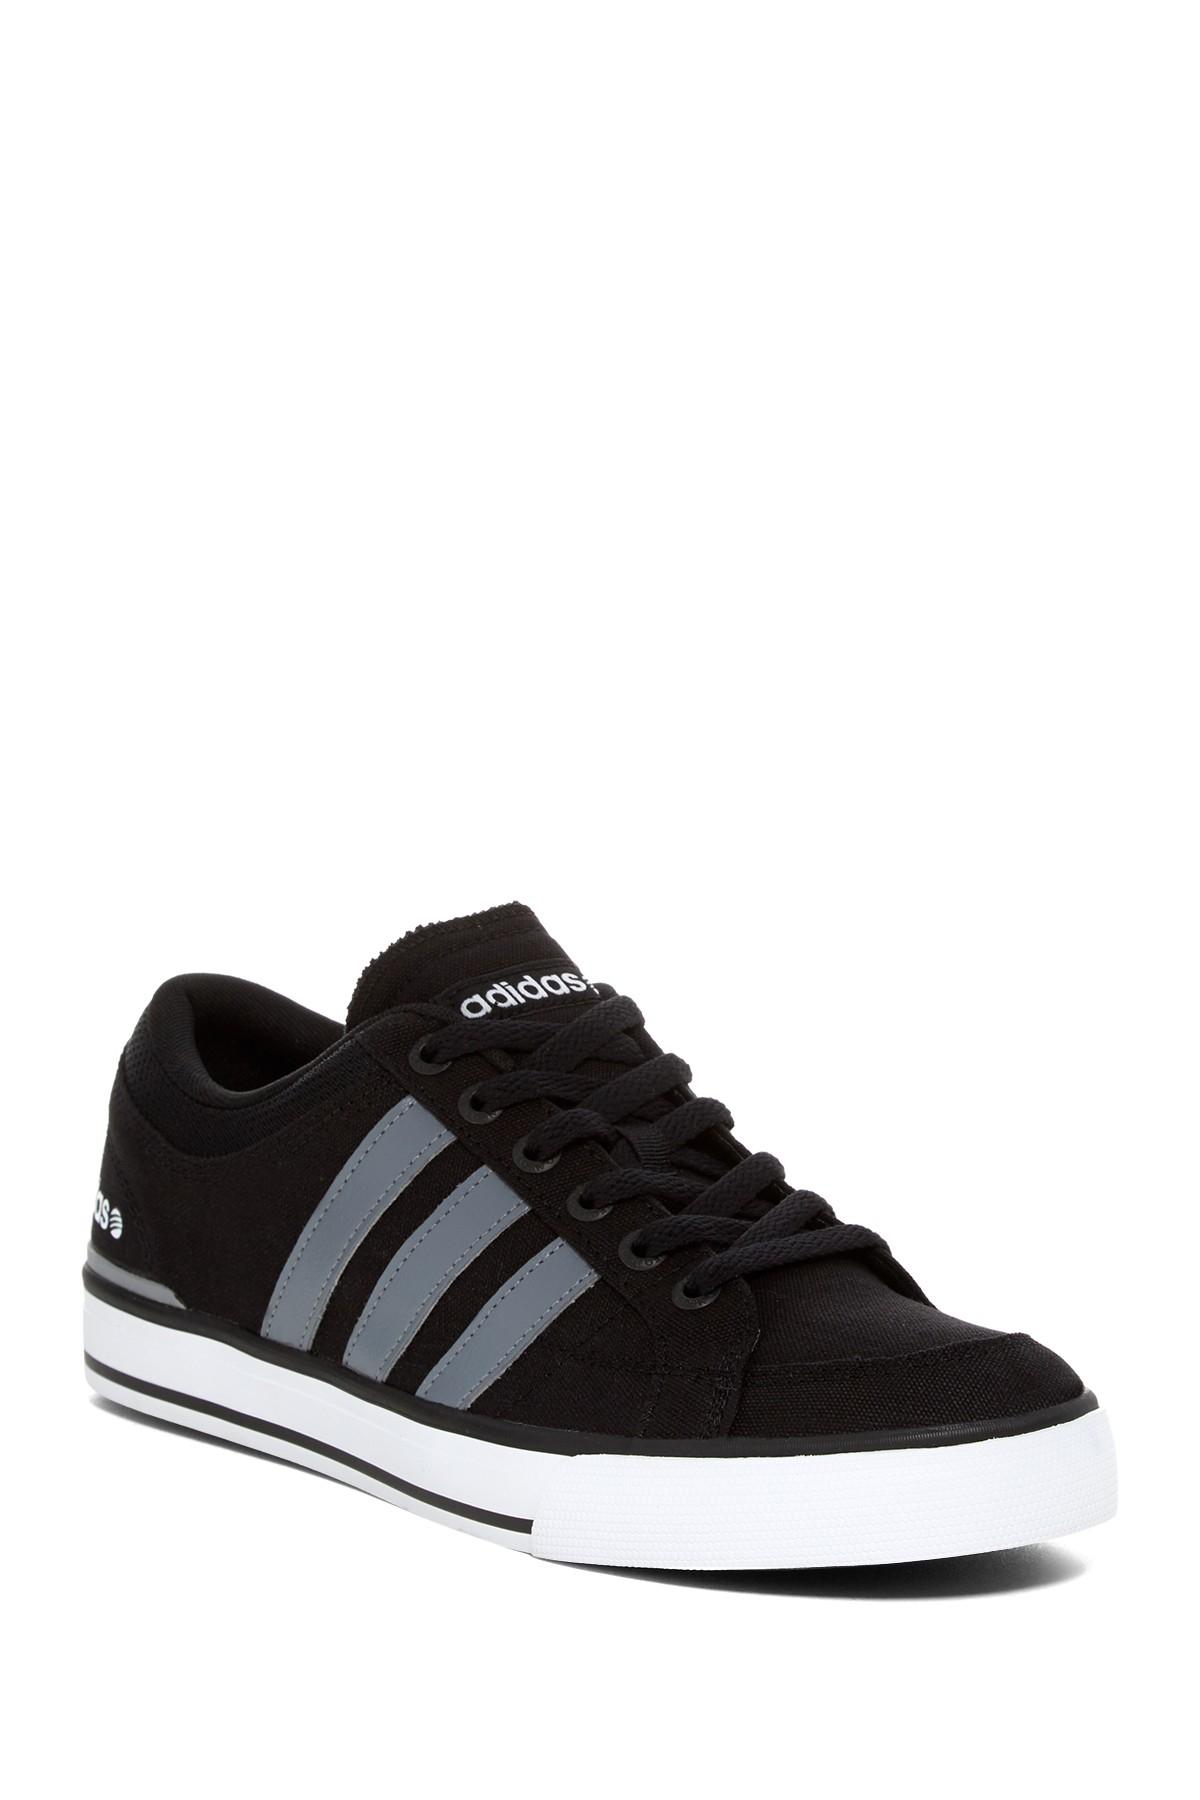 Bbneo Skool Lo Sneaker